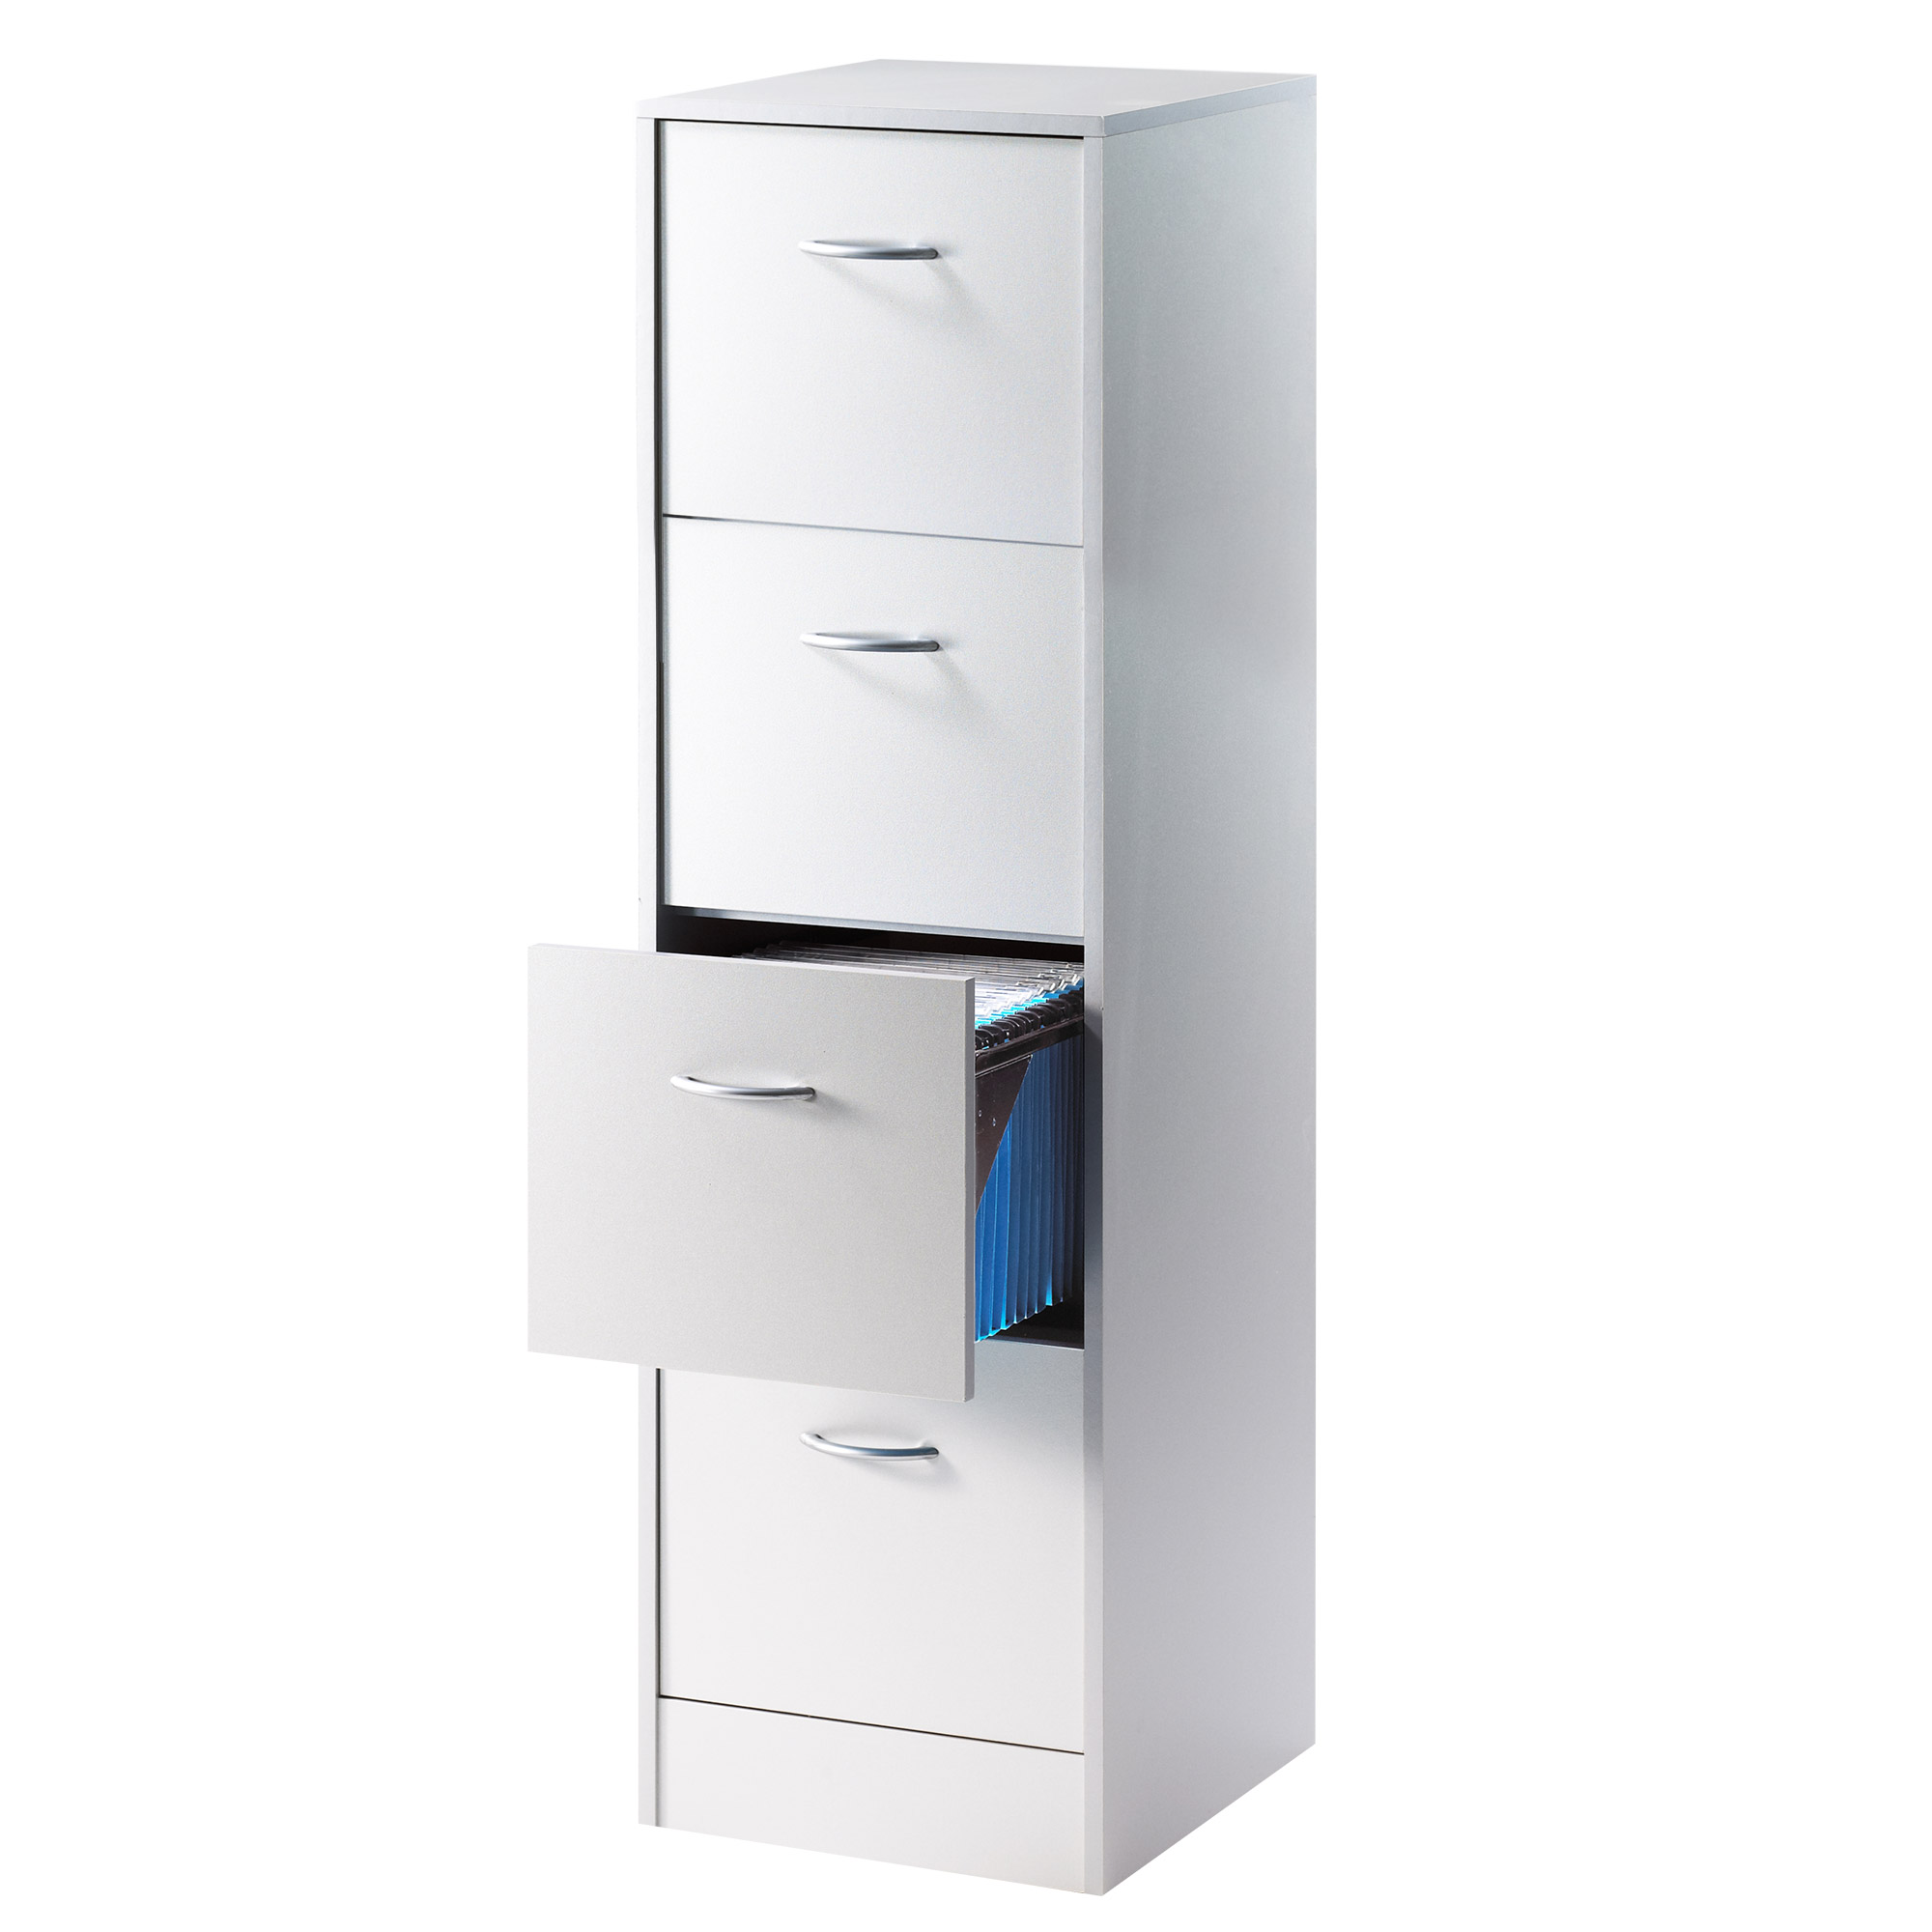 classeurs tiroirs dossiers suspendus hauteur 140 cm alu ebay. Black Bedroom Furniture Sets. Home Design Ideas